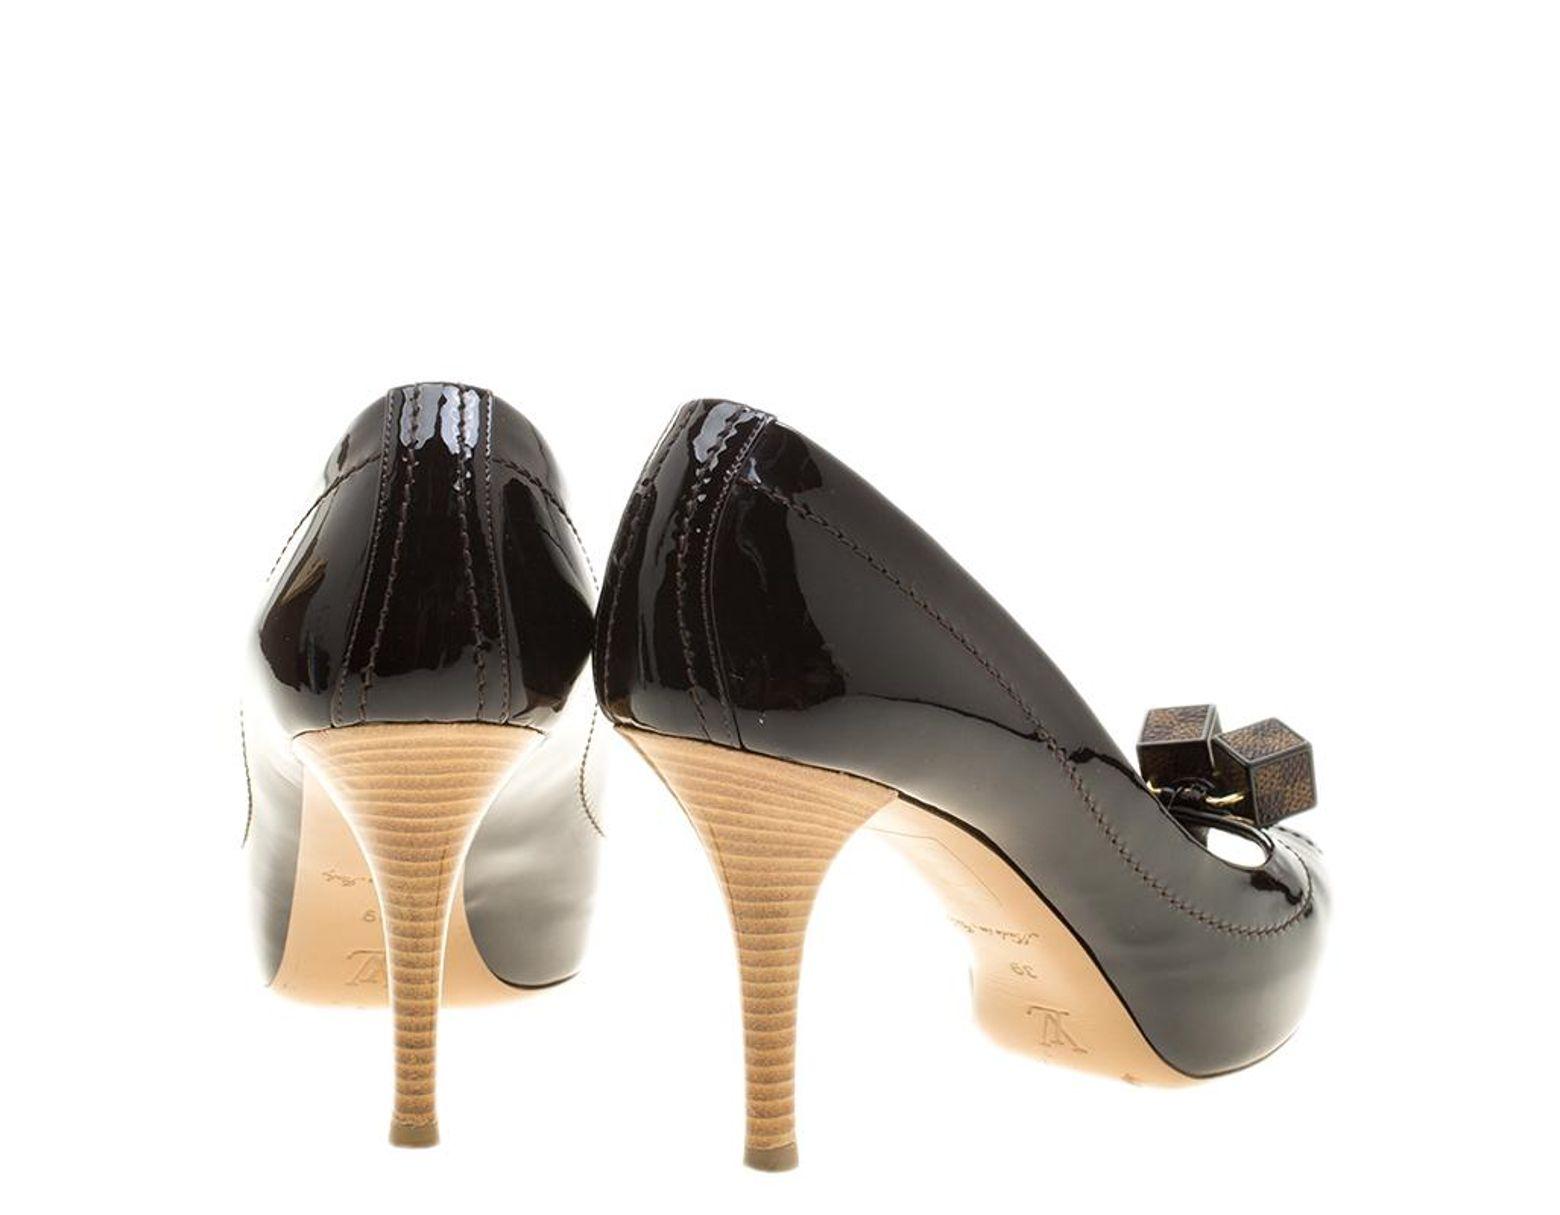 1aa5c6b831 Louis Vuitton Black Vernis Leather Dice Peep Toe Platform Pumps Size 39 in  Black - Lyst